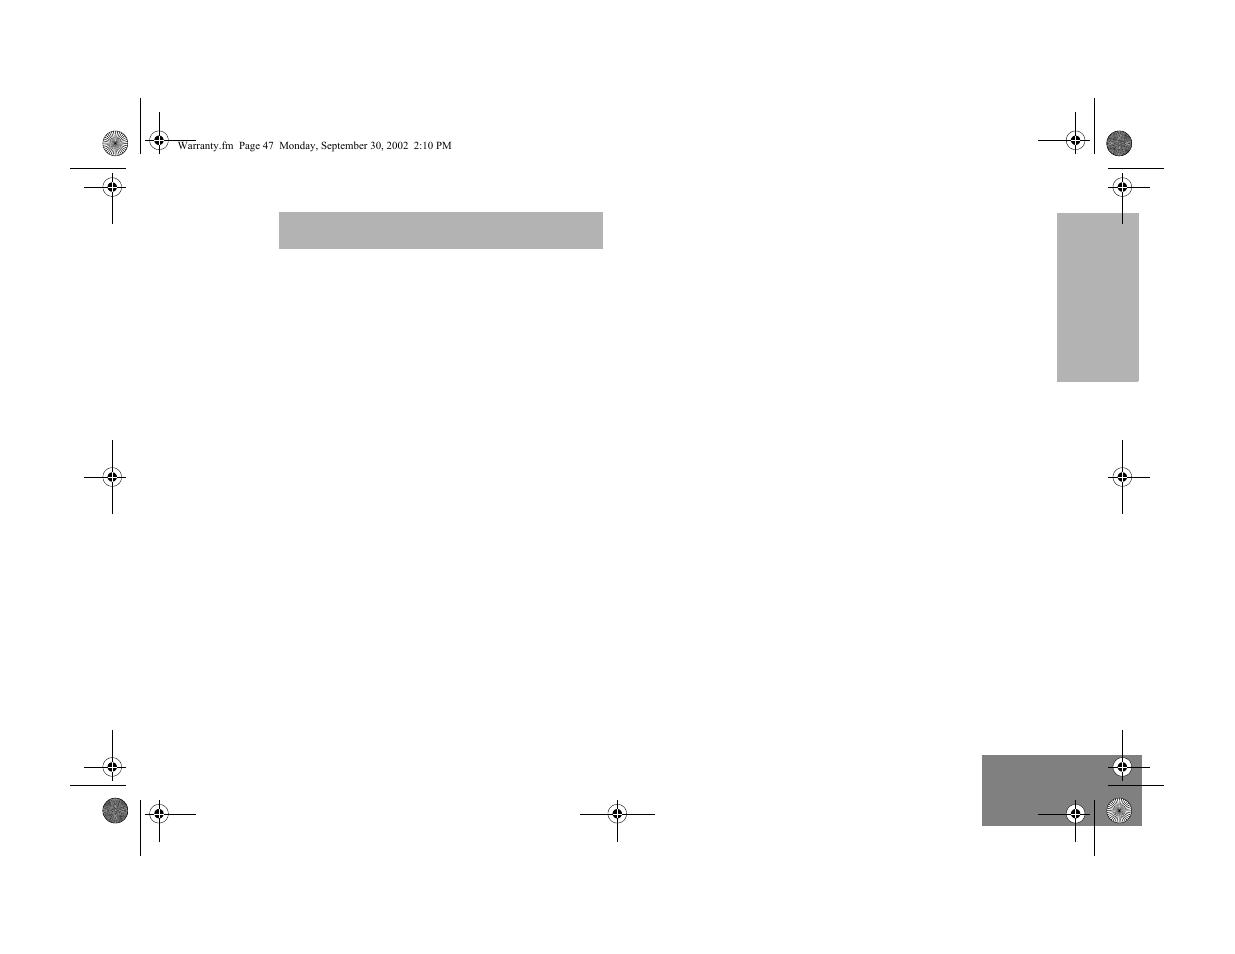 Motorola Ht1250 Wiring Diagram Schematic Diagrams Cdm1250 Example Electrical U2022 Vhf